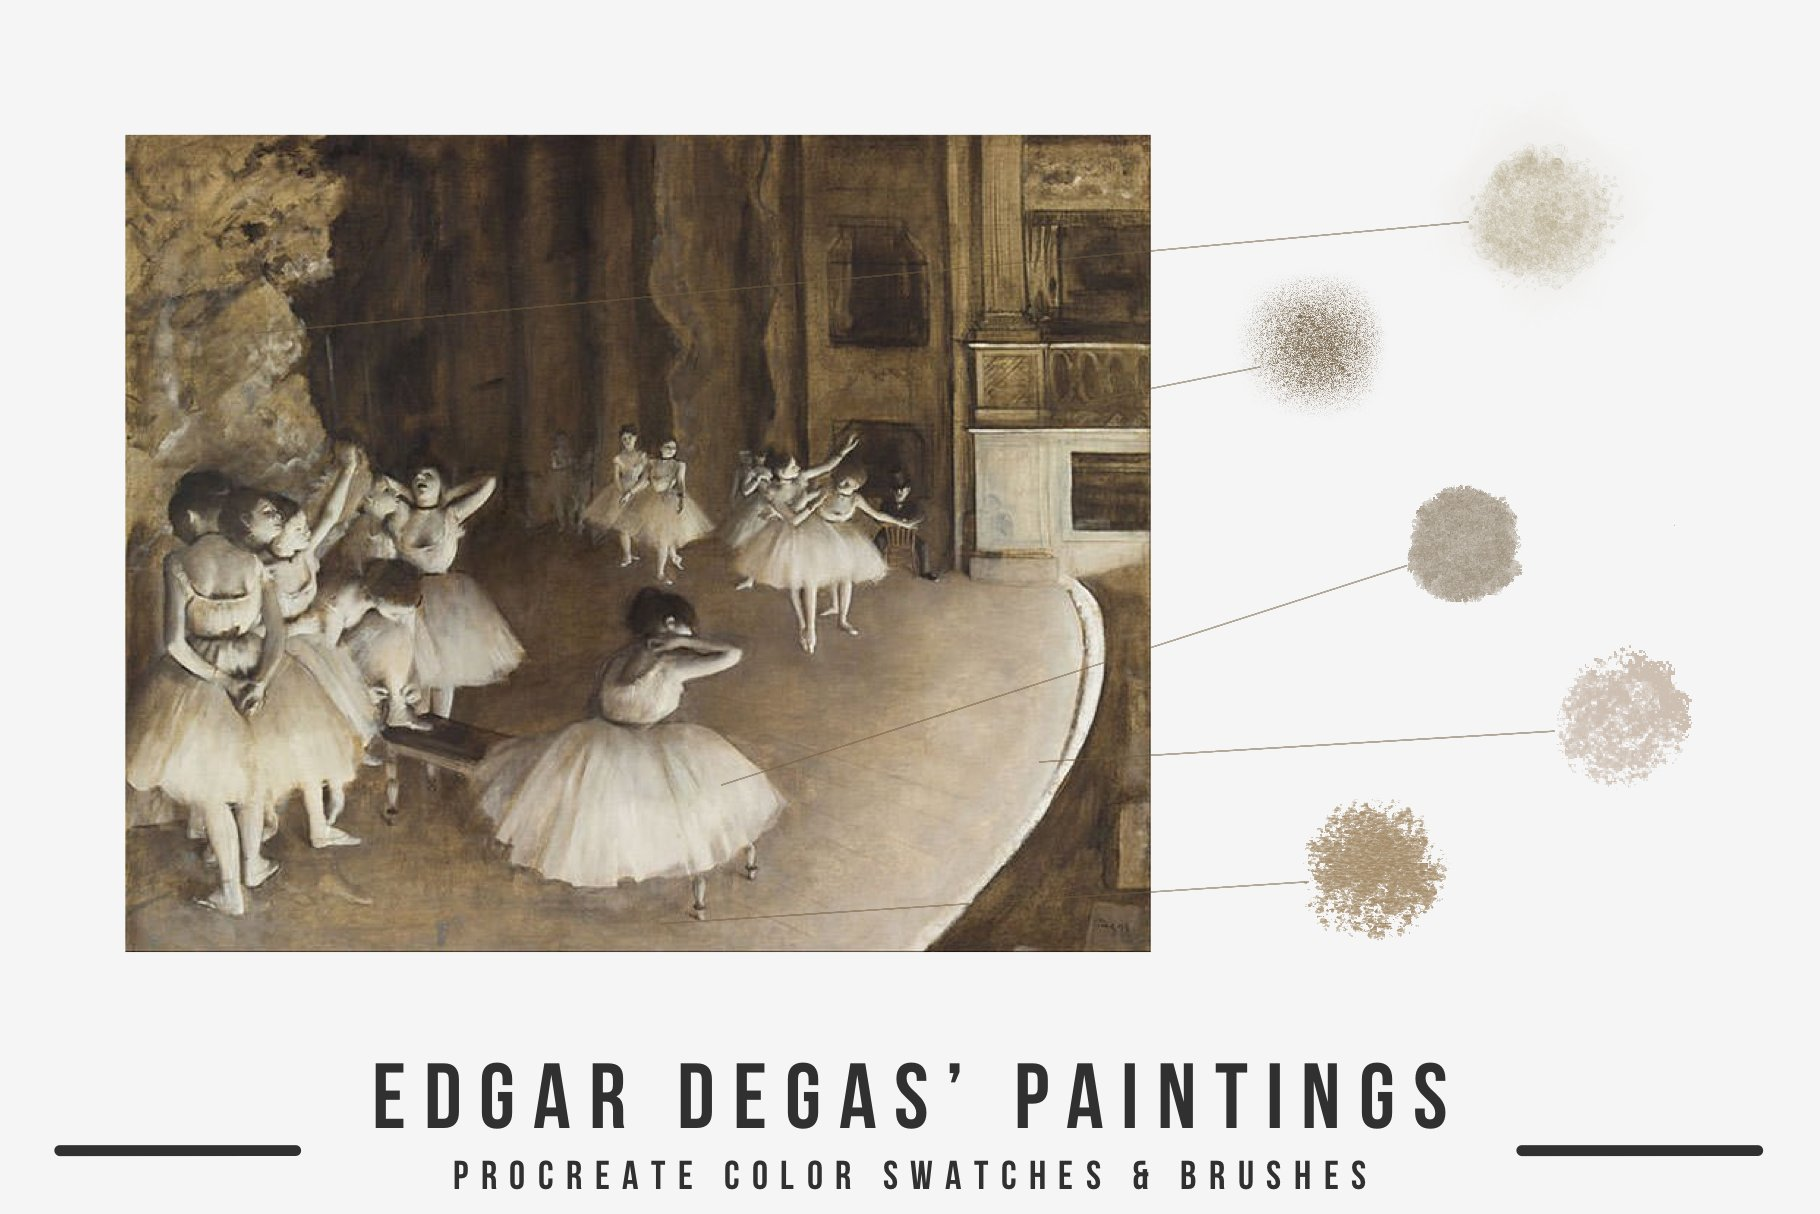 دانلود براش Edgar Degas Art پروکریت